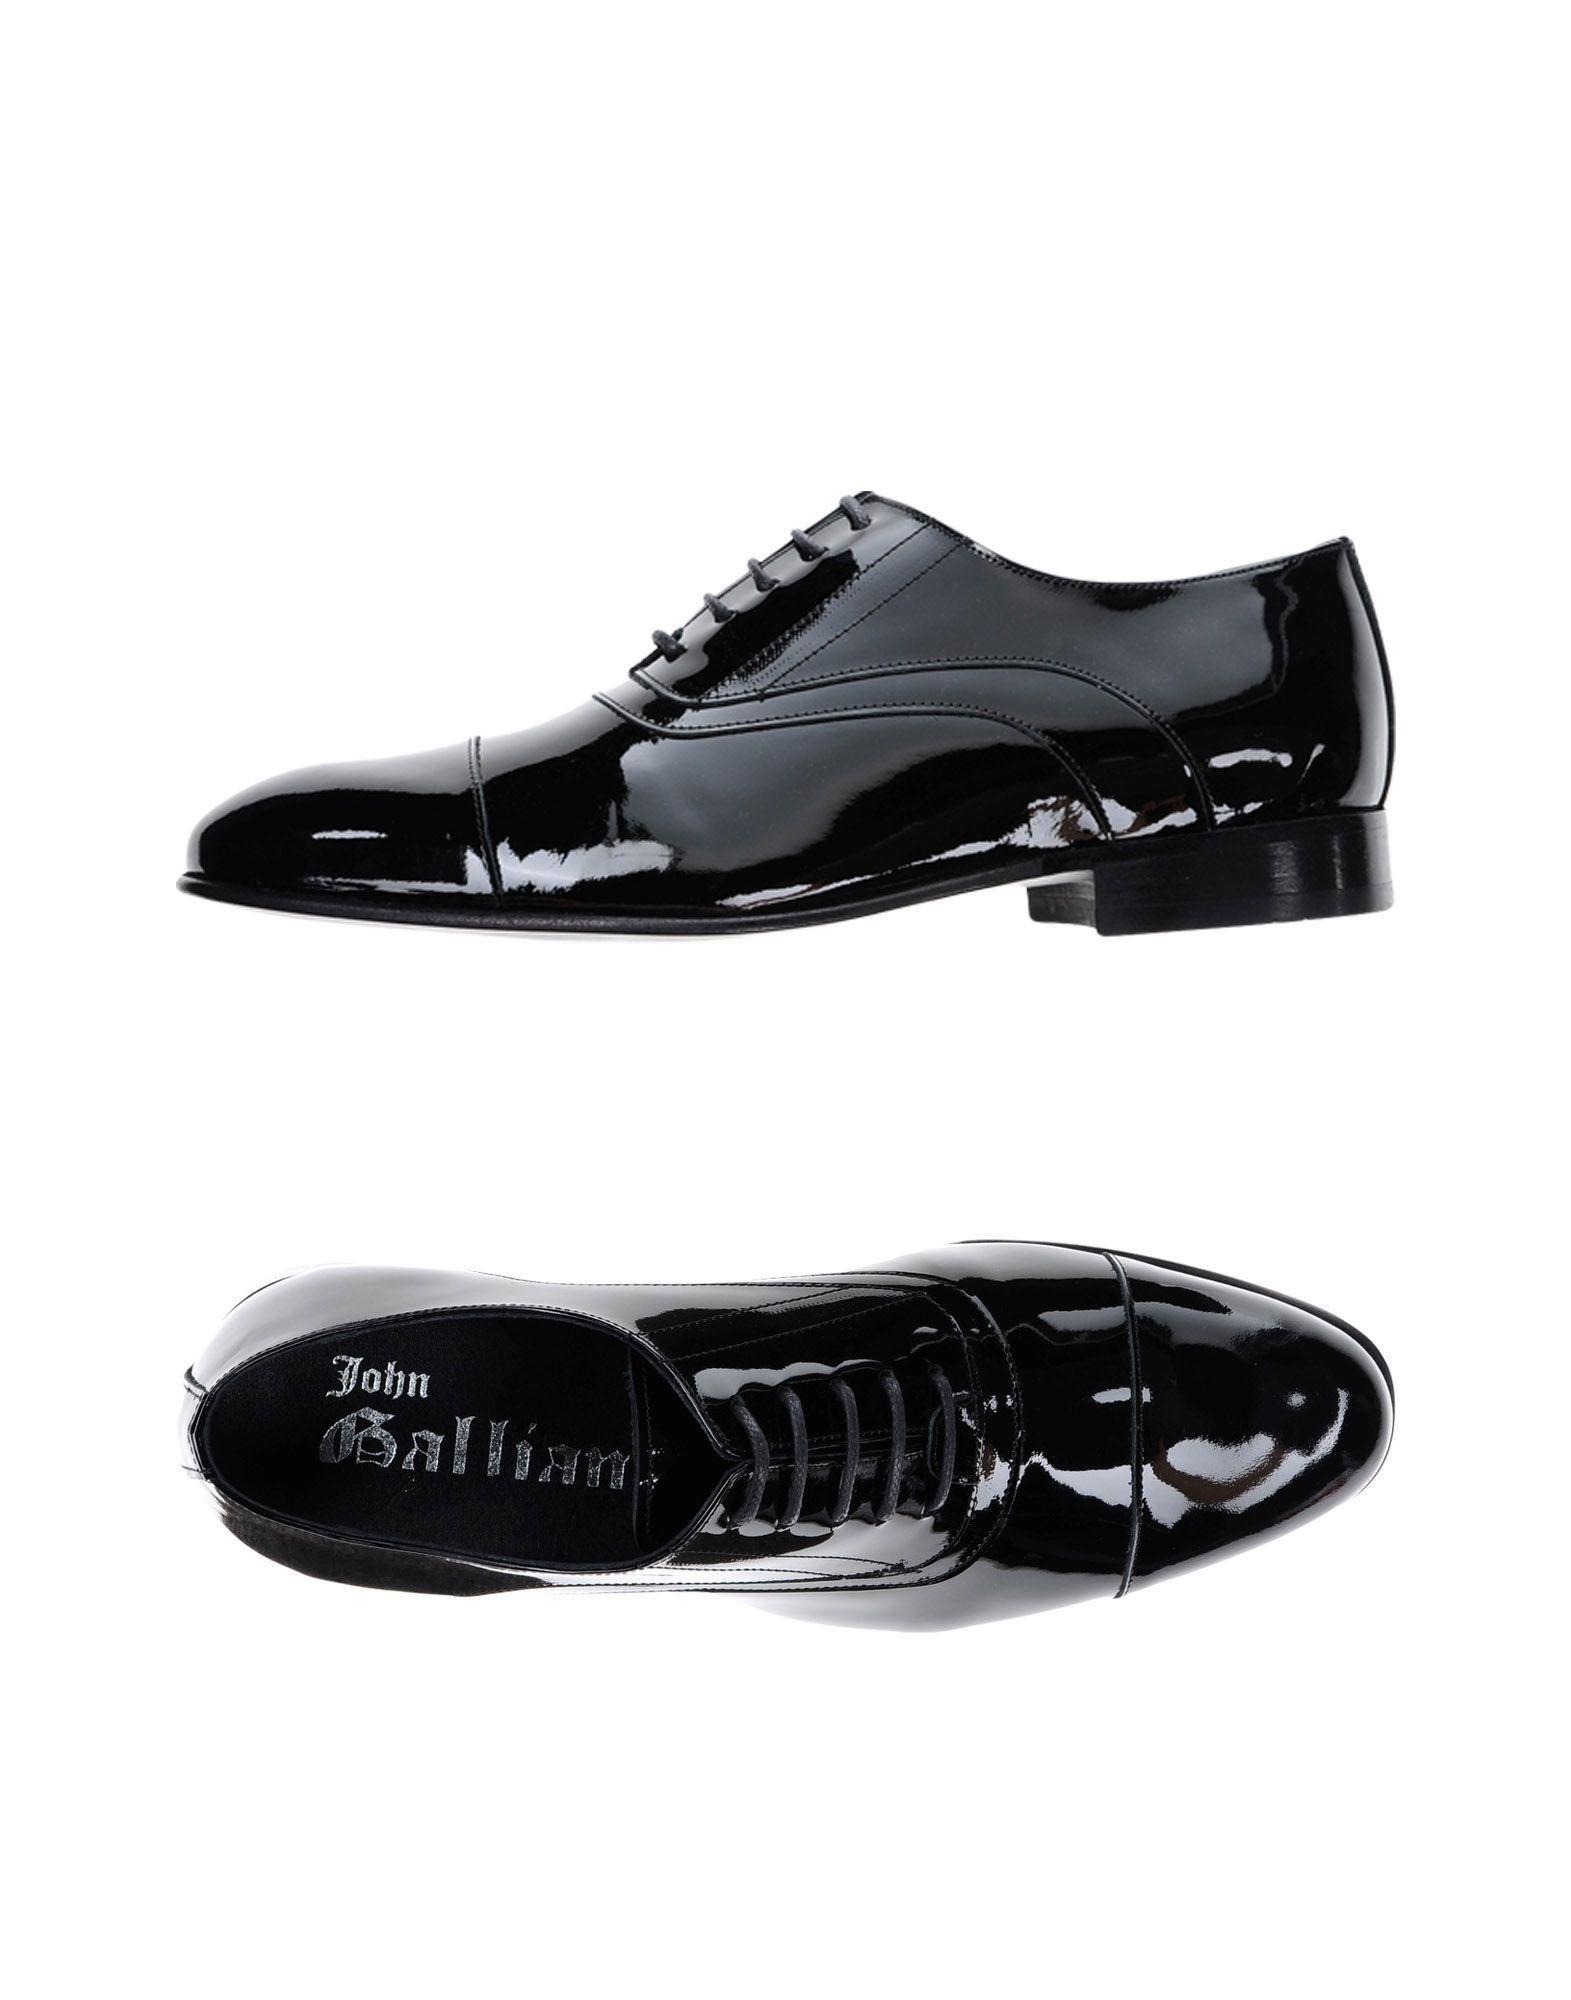 Buy Galliano Shoes